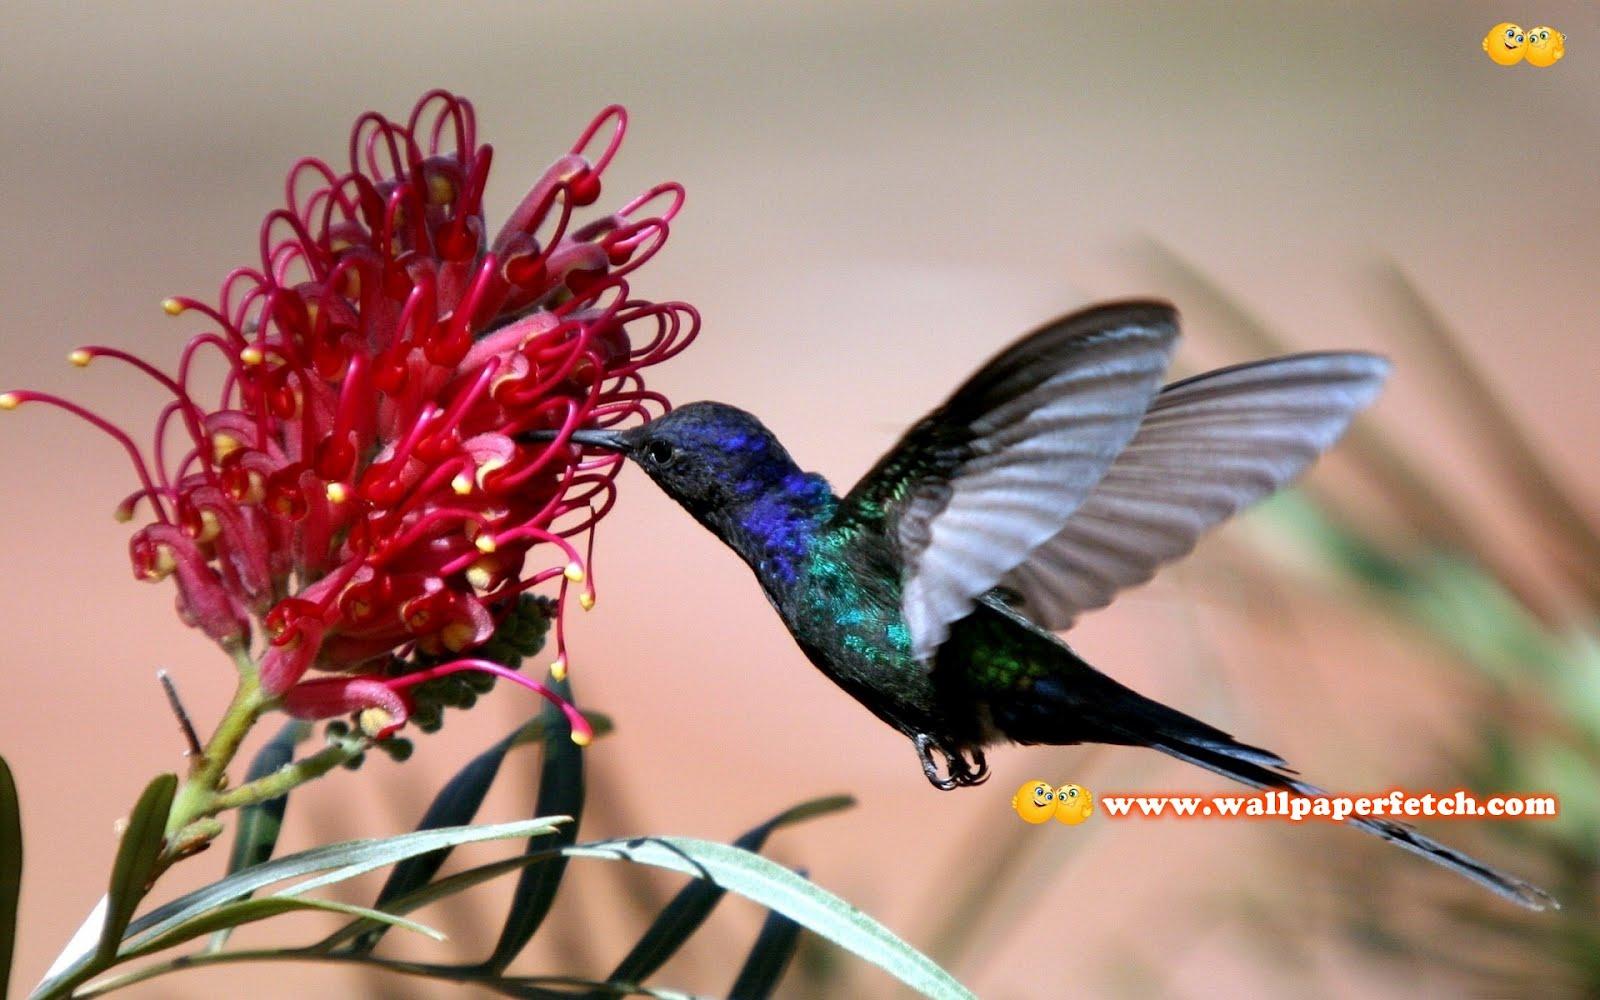 http://1.bp.blogspot.com/-wC1tlzXvhPA/T1CmHVnVzsI/AAAAAAAAMoI/8DznAUNWqOU/s1600/hummingbird-10654-1920x1200.jpg